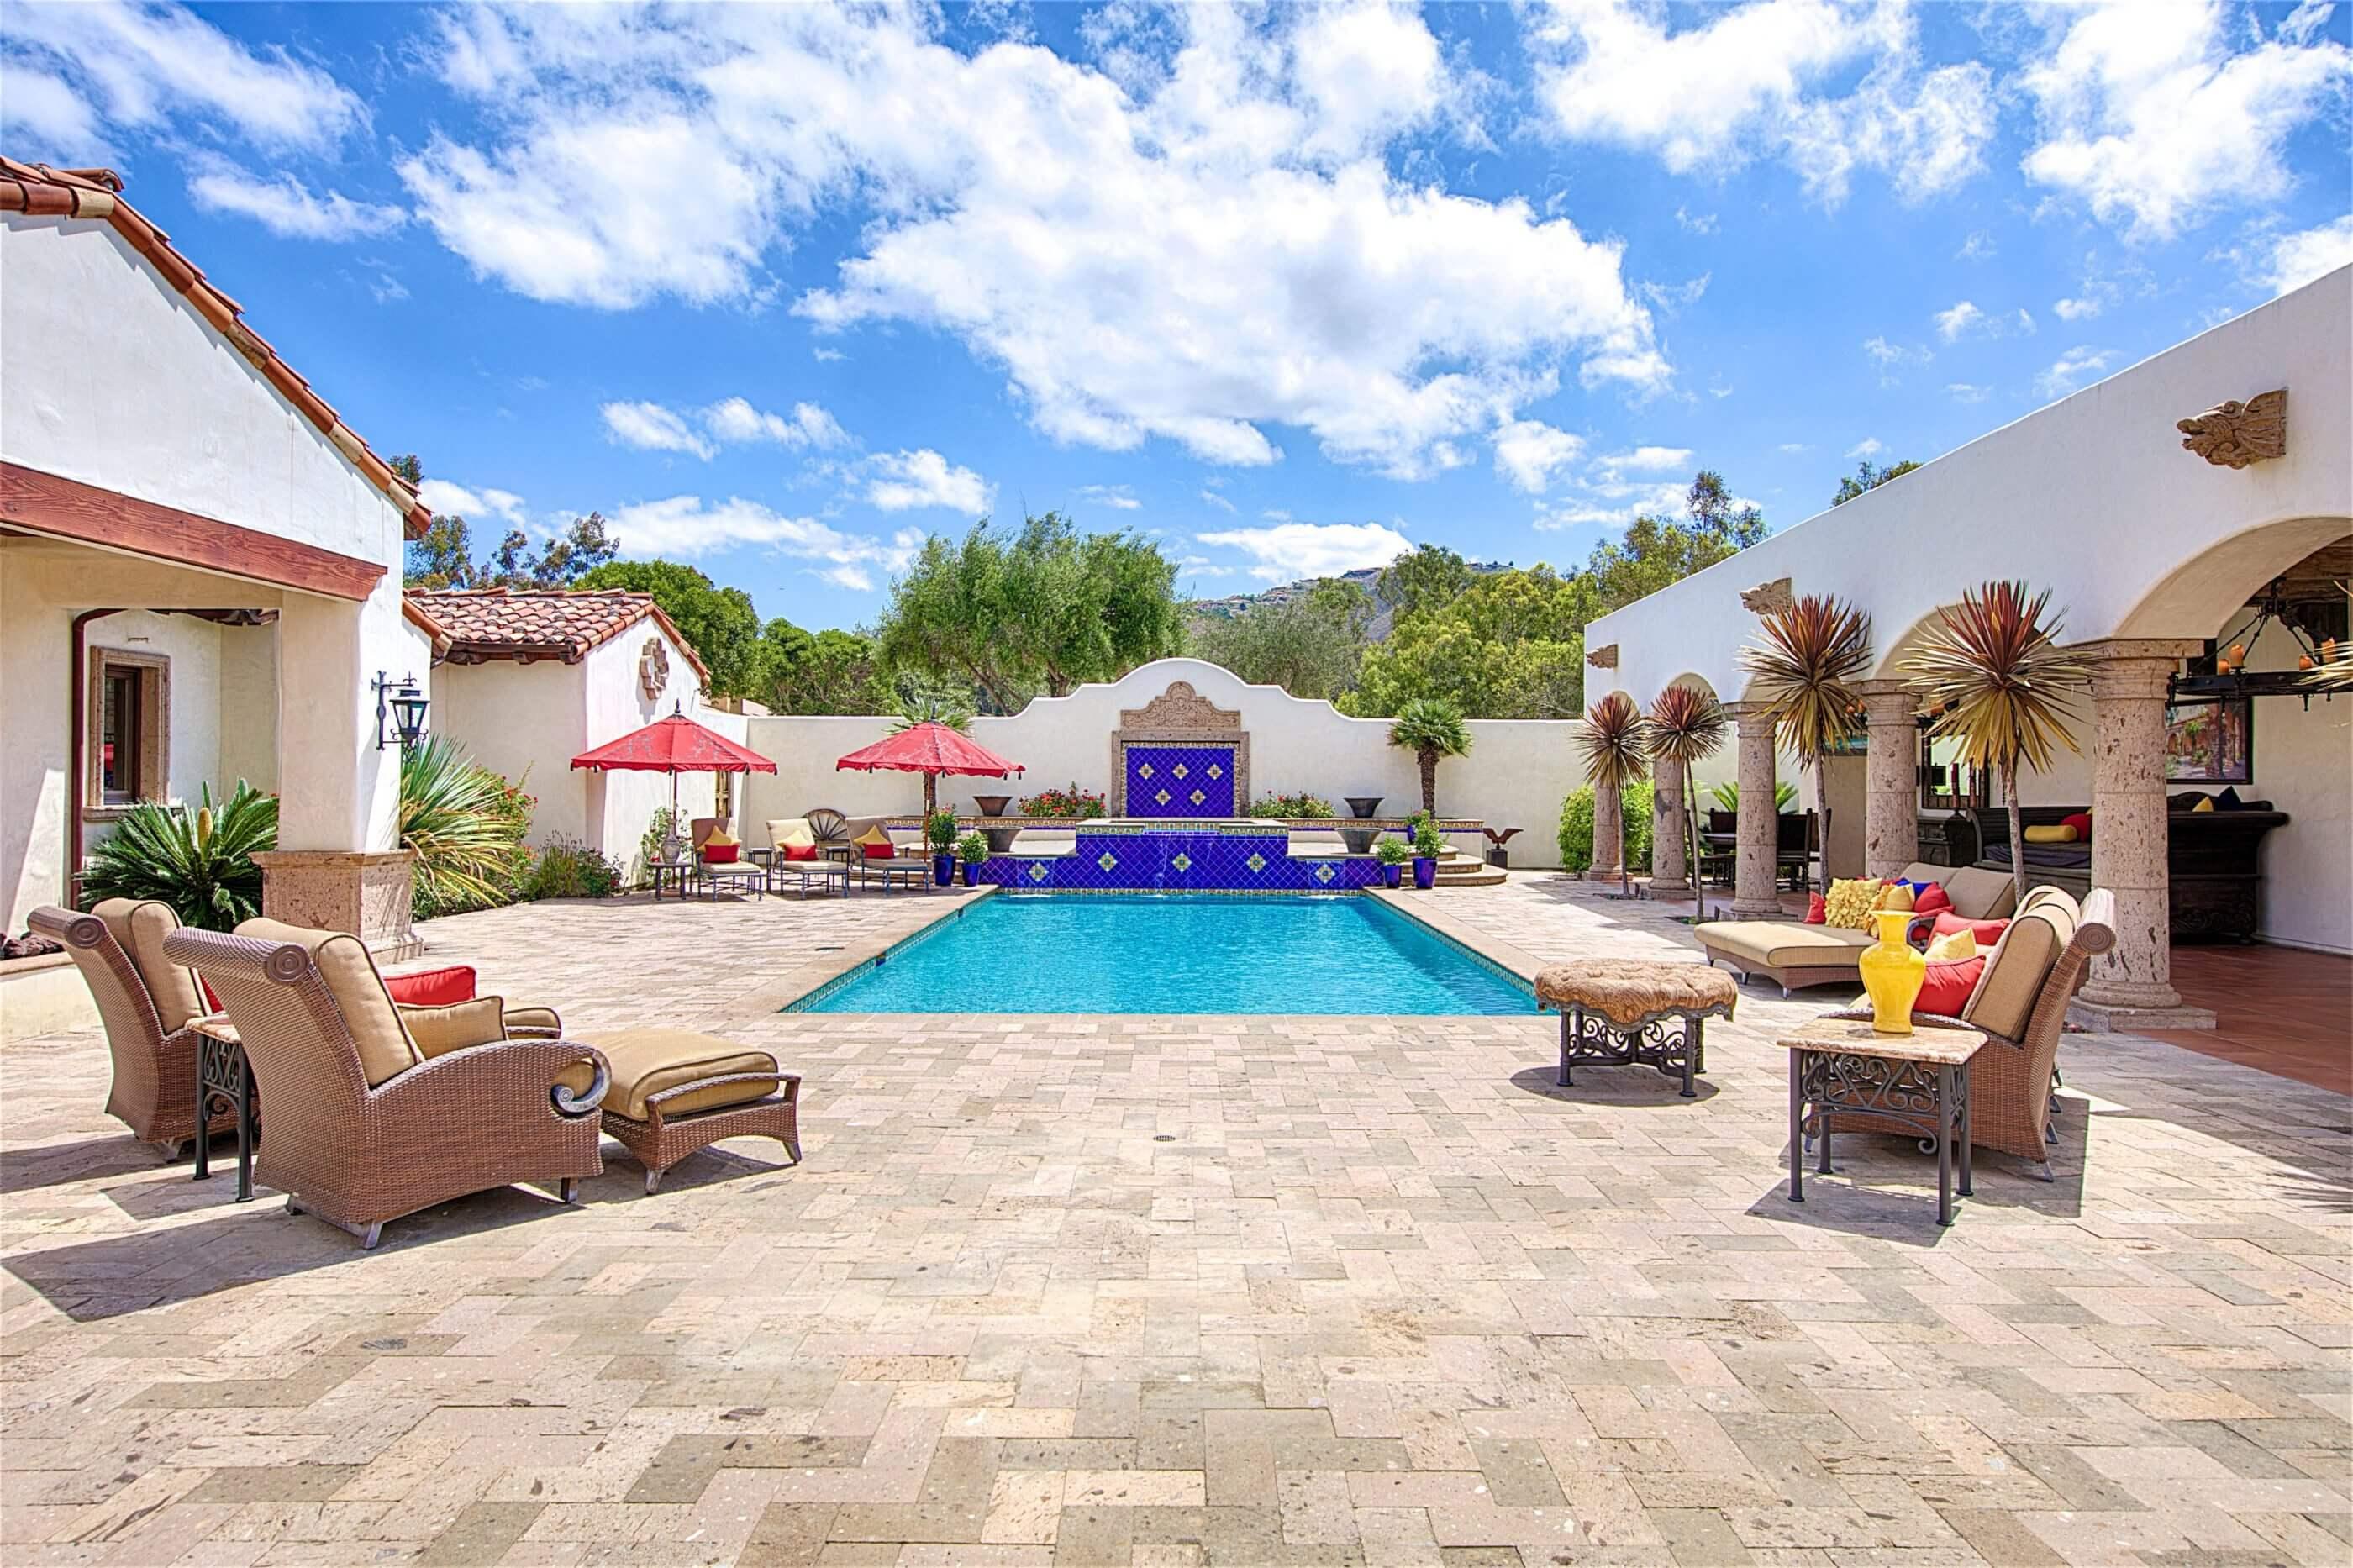 $7million Rancho Santa Fe, California – No Annual Fees